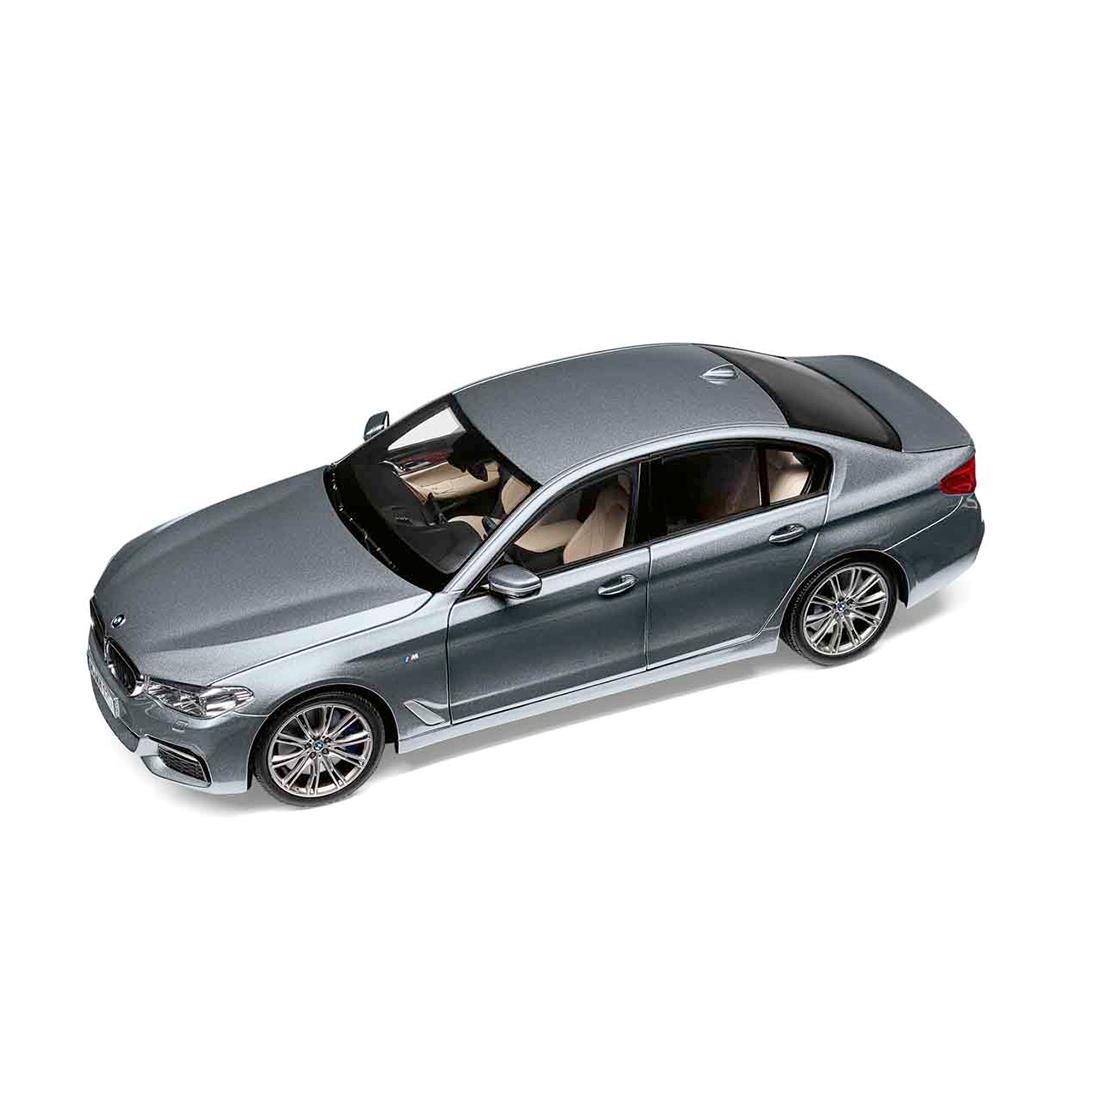 BMW MINIATURE 5 SERIES (G30) 1:18